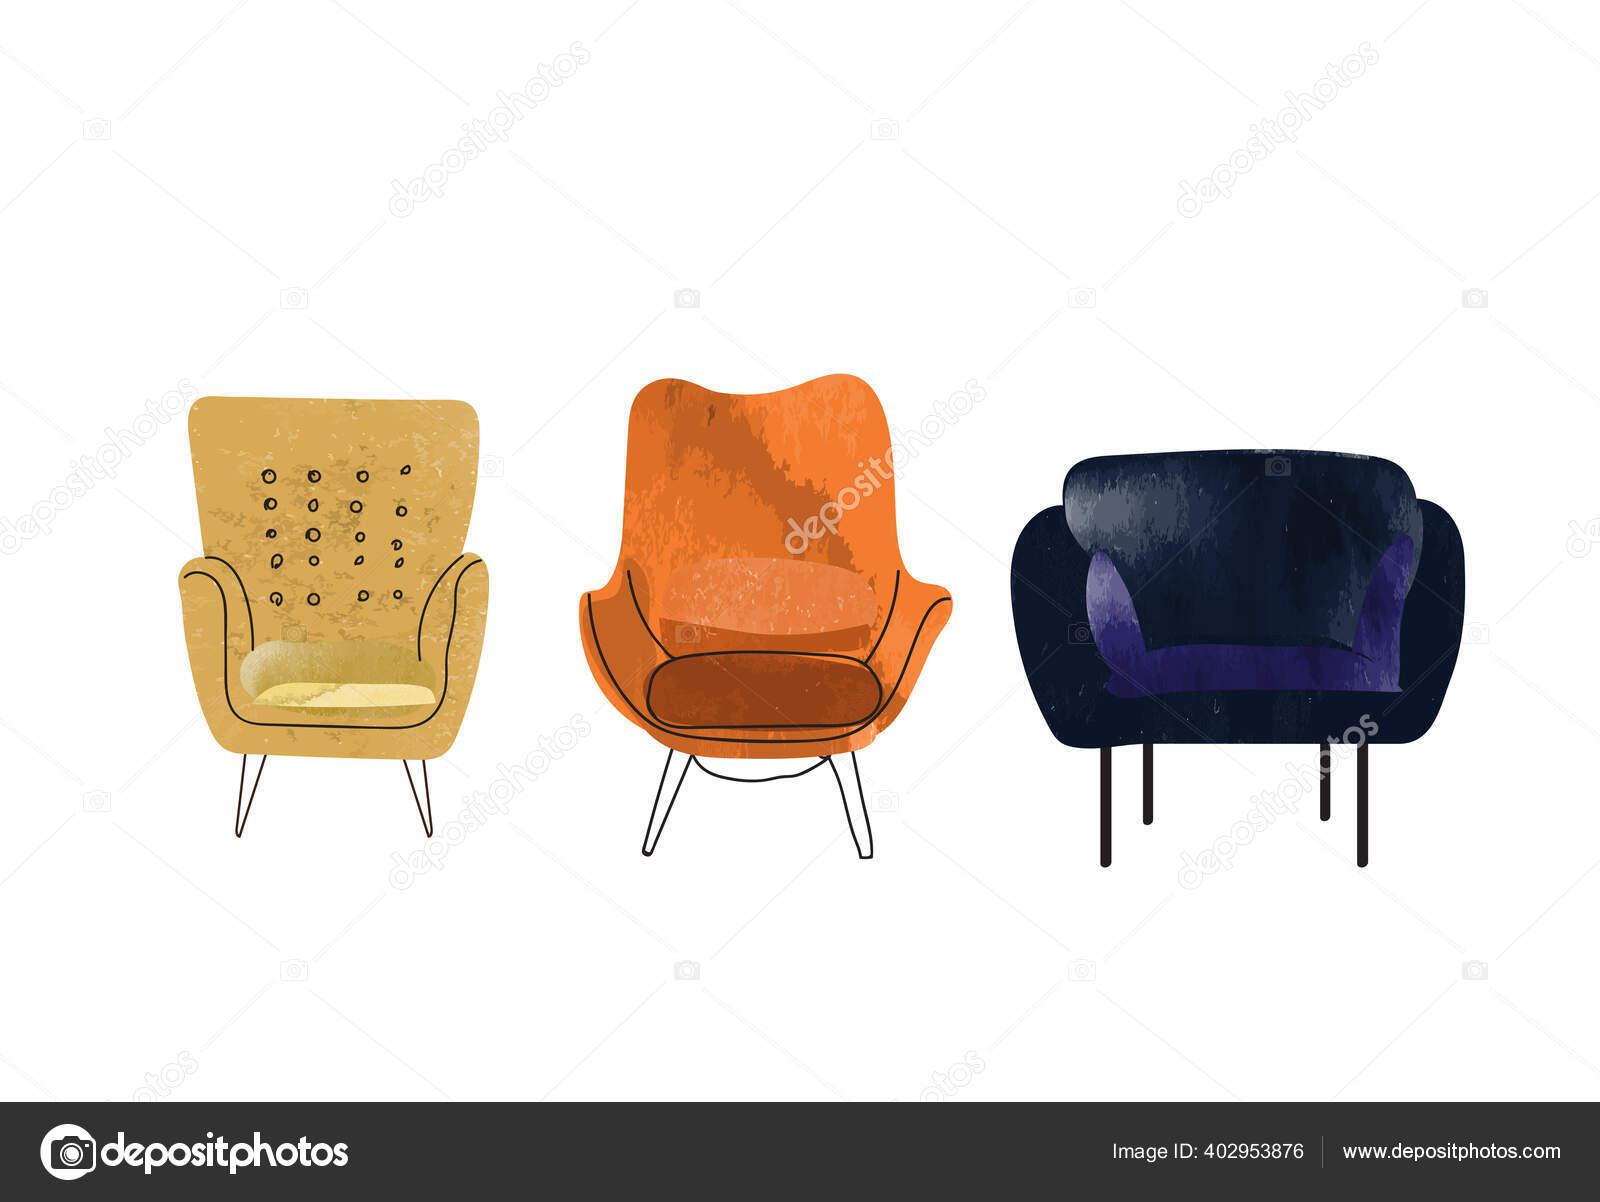 Armchair Sketch Hand Drawn Chair Vector Furniture Illustration Mid Century Vector Image By Joanna Rosado Gmail Com Vector Stock 402953876